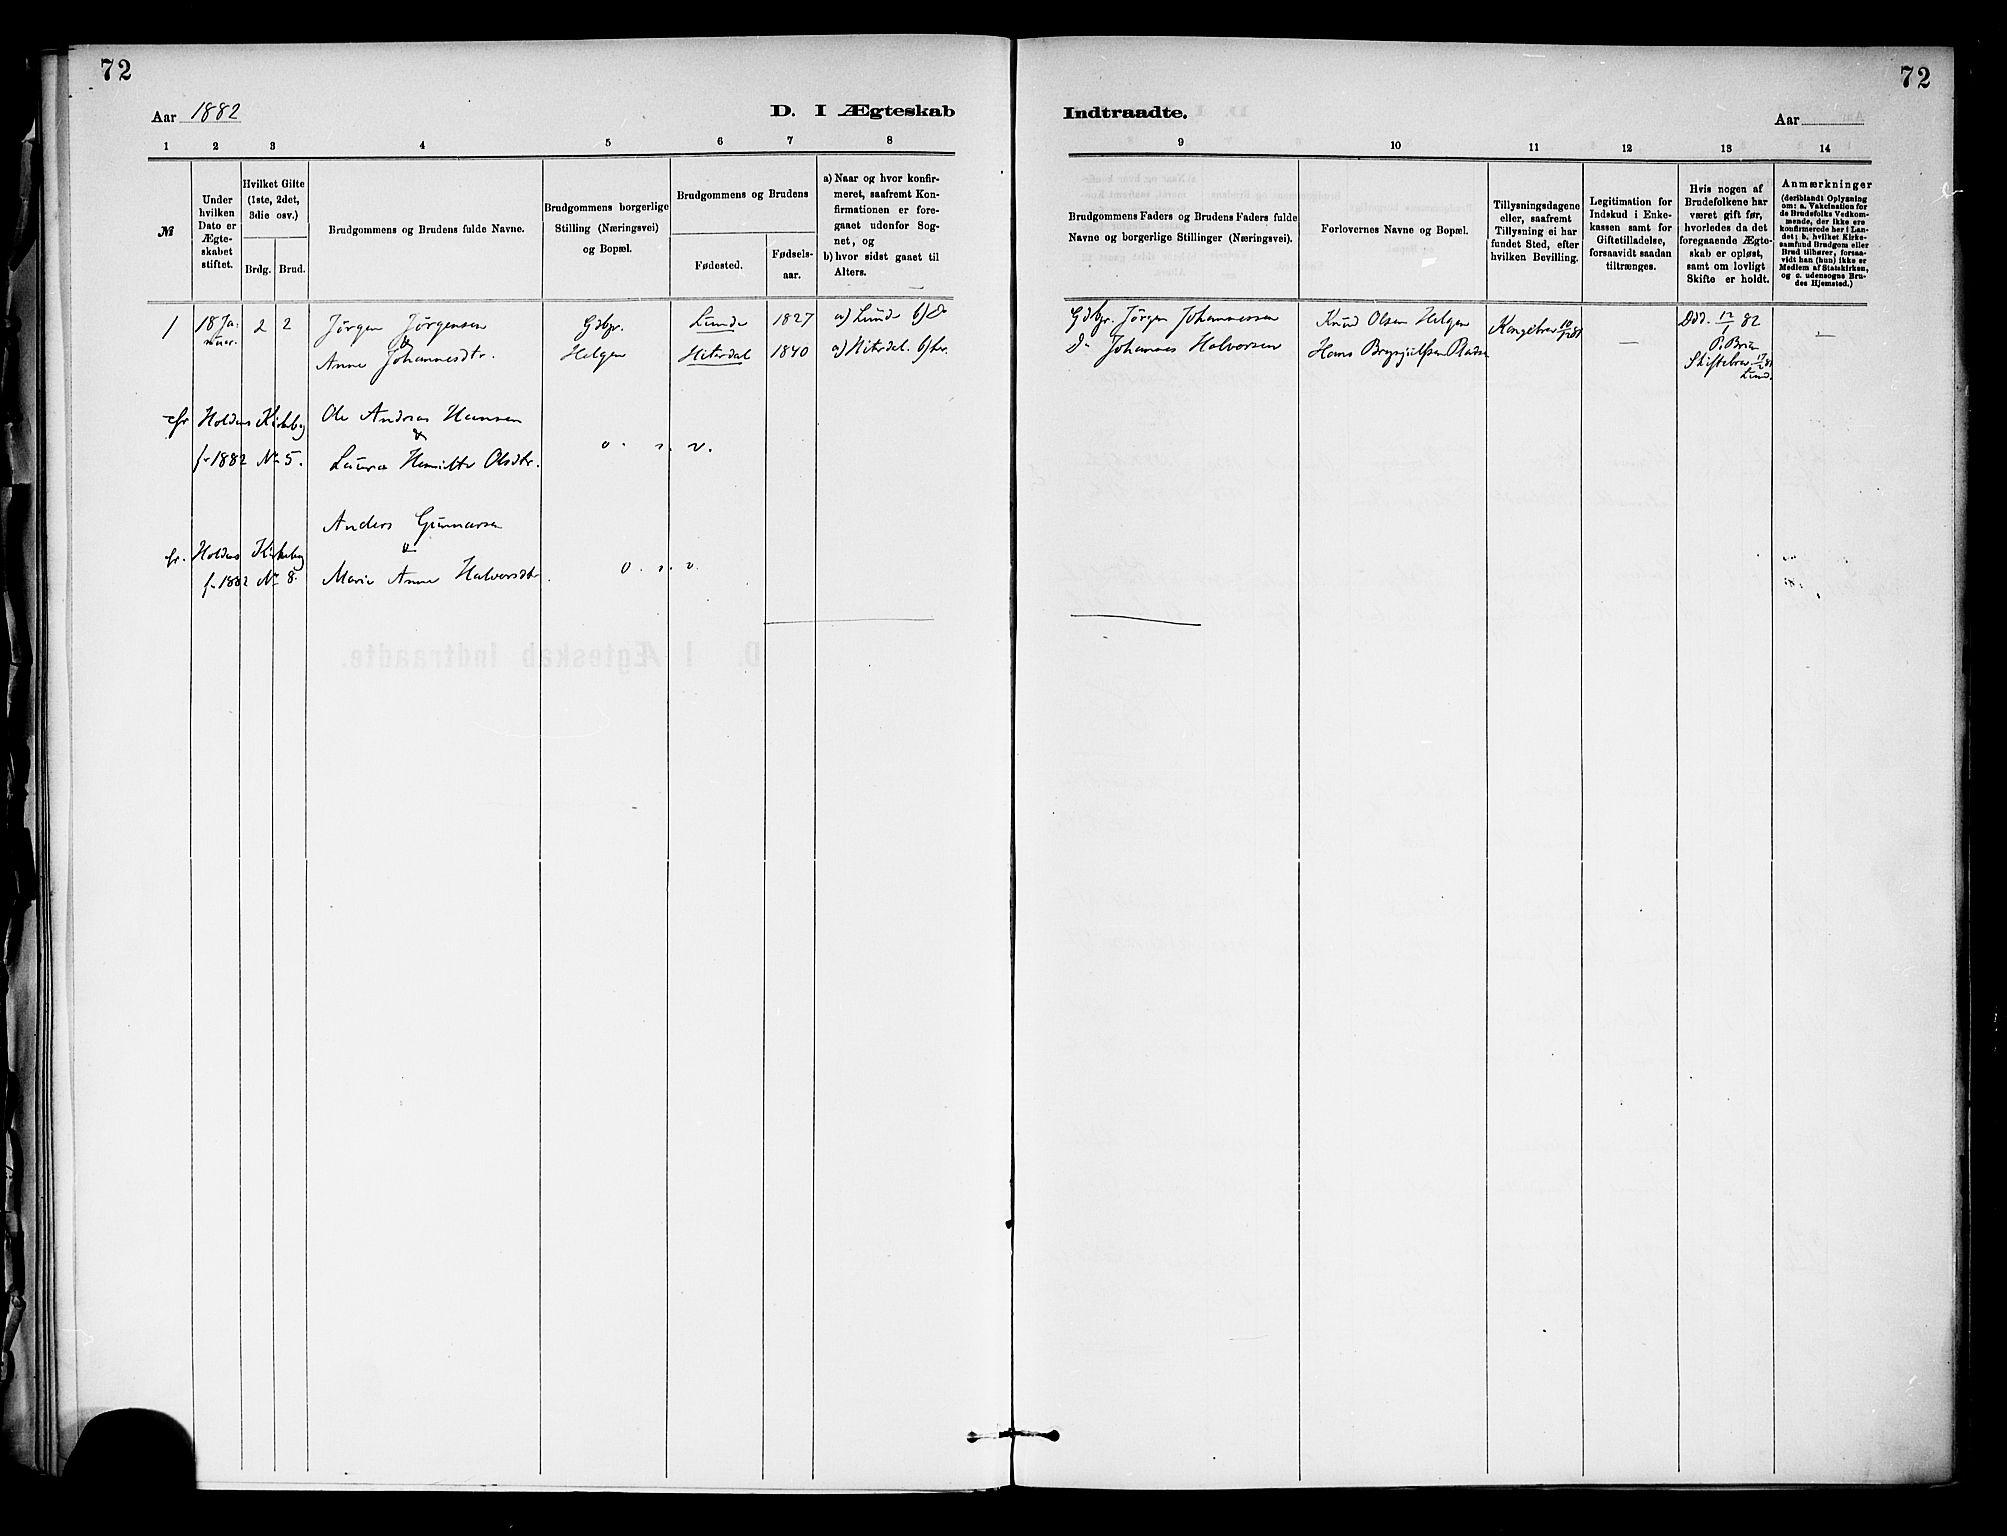 SAKO, Holla kirkebøker, F/Fa/L0009: Ministerialbok nr. 9, 1881-1897, s. 72